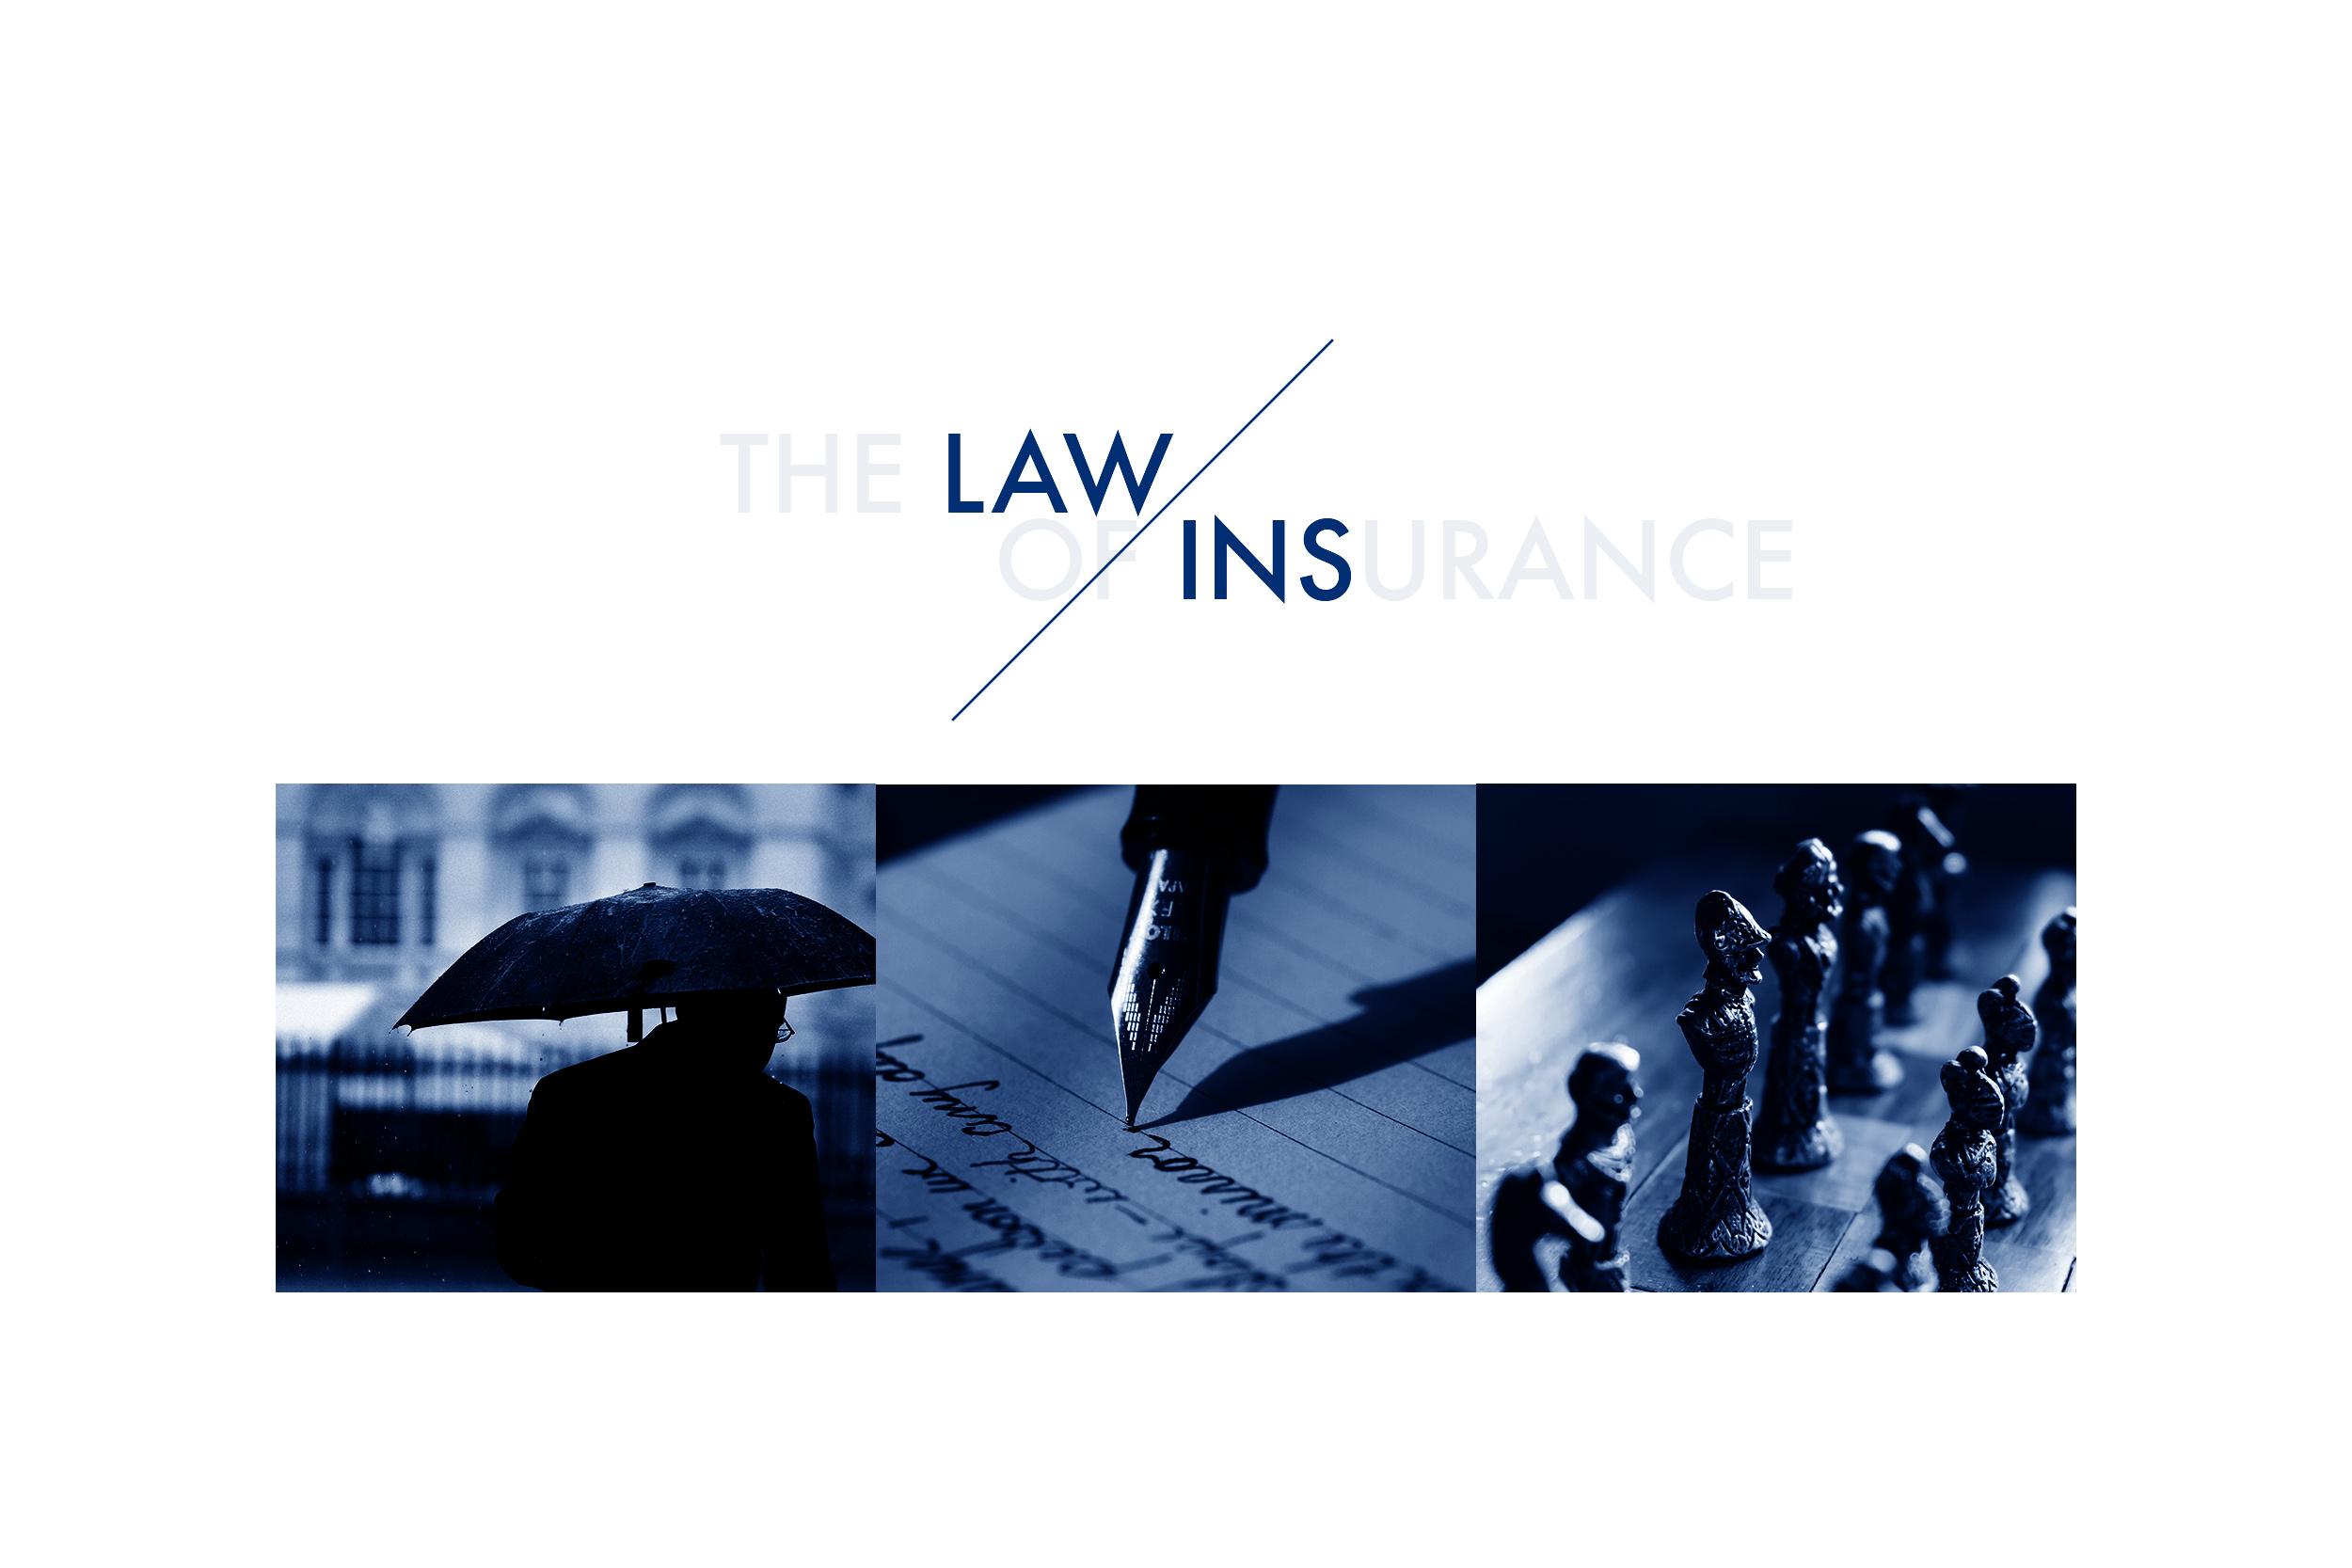 moodboard-lawins-avocats-logo-better-stronger-paris.jpg